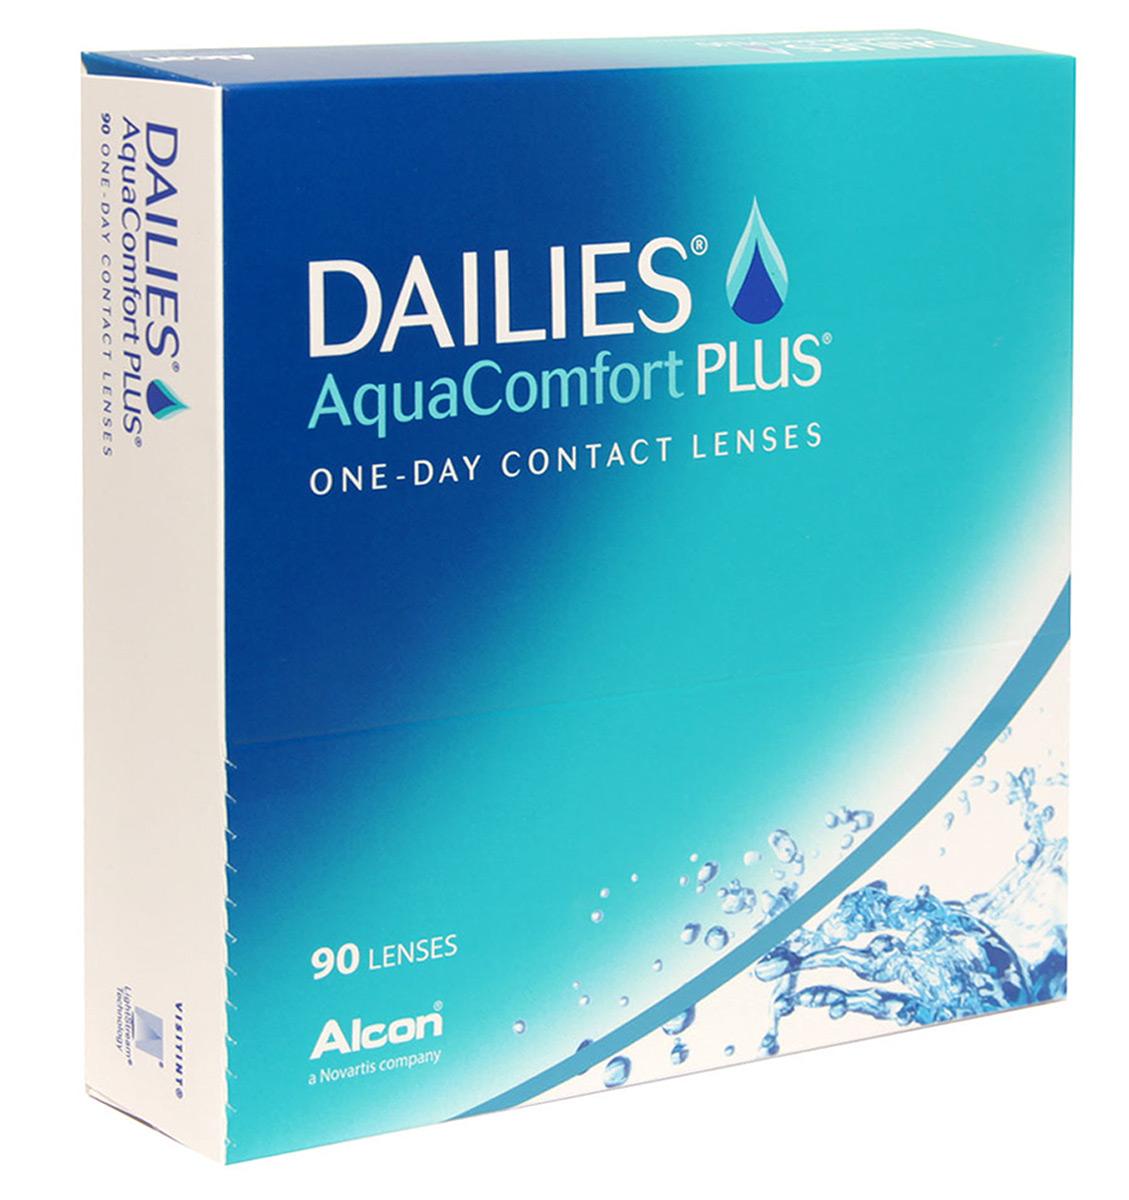 Alcon-CIBA Vision контактные линзы Dailies AquaComfort Plus (90шт / 8.7 / 14.0 / -5.00)